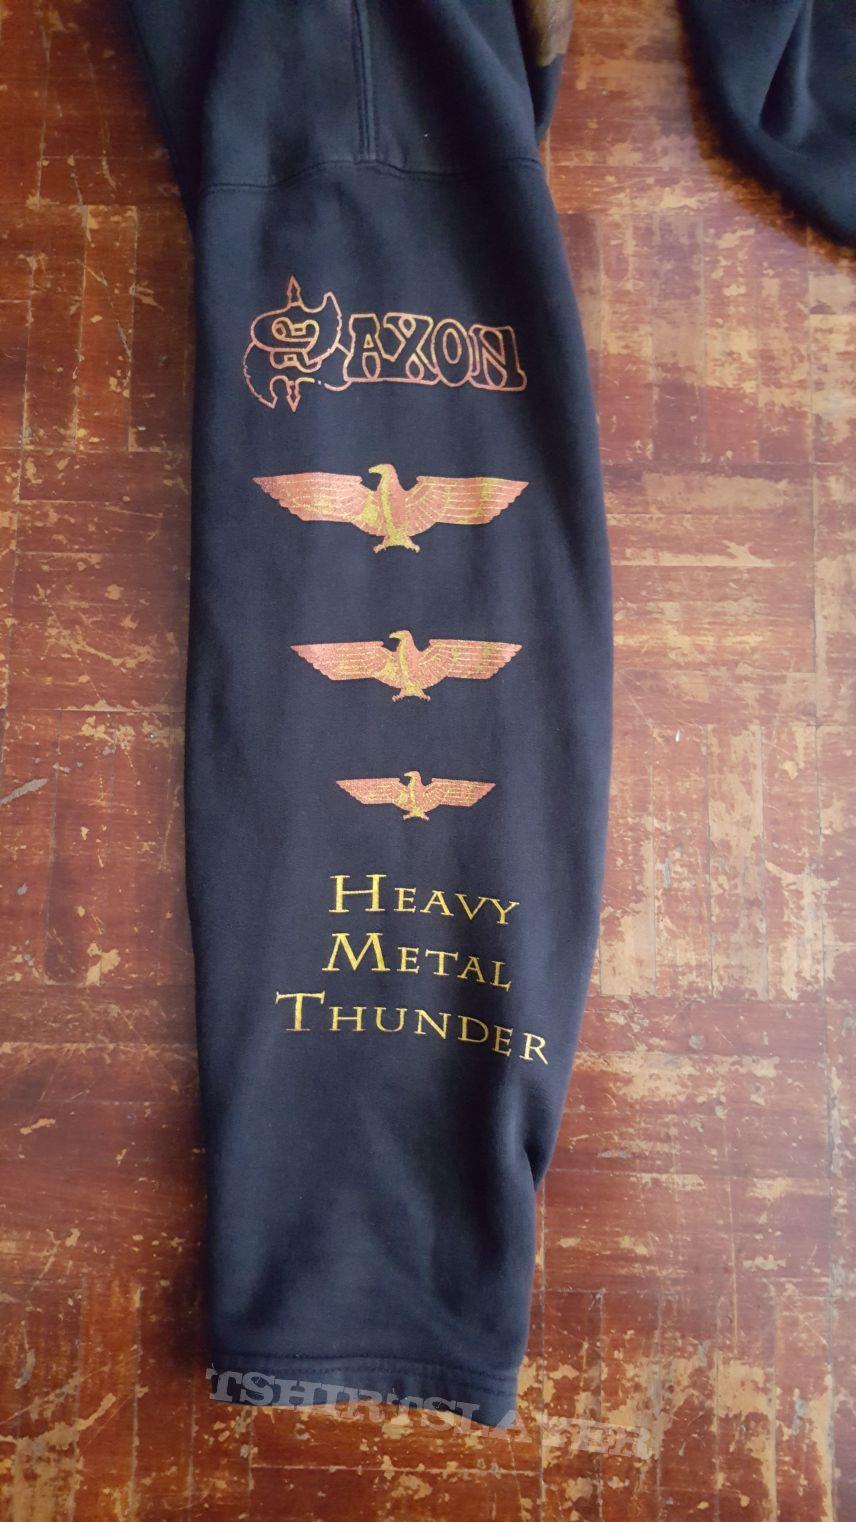 Saxon - Heavy Metal Thunder Hoodie